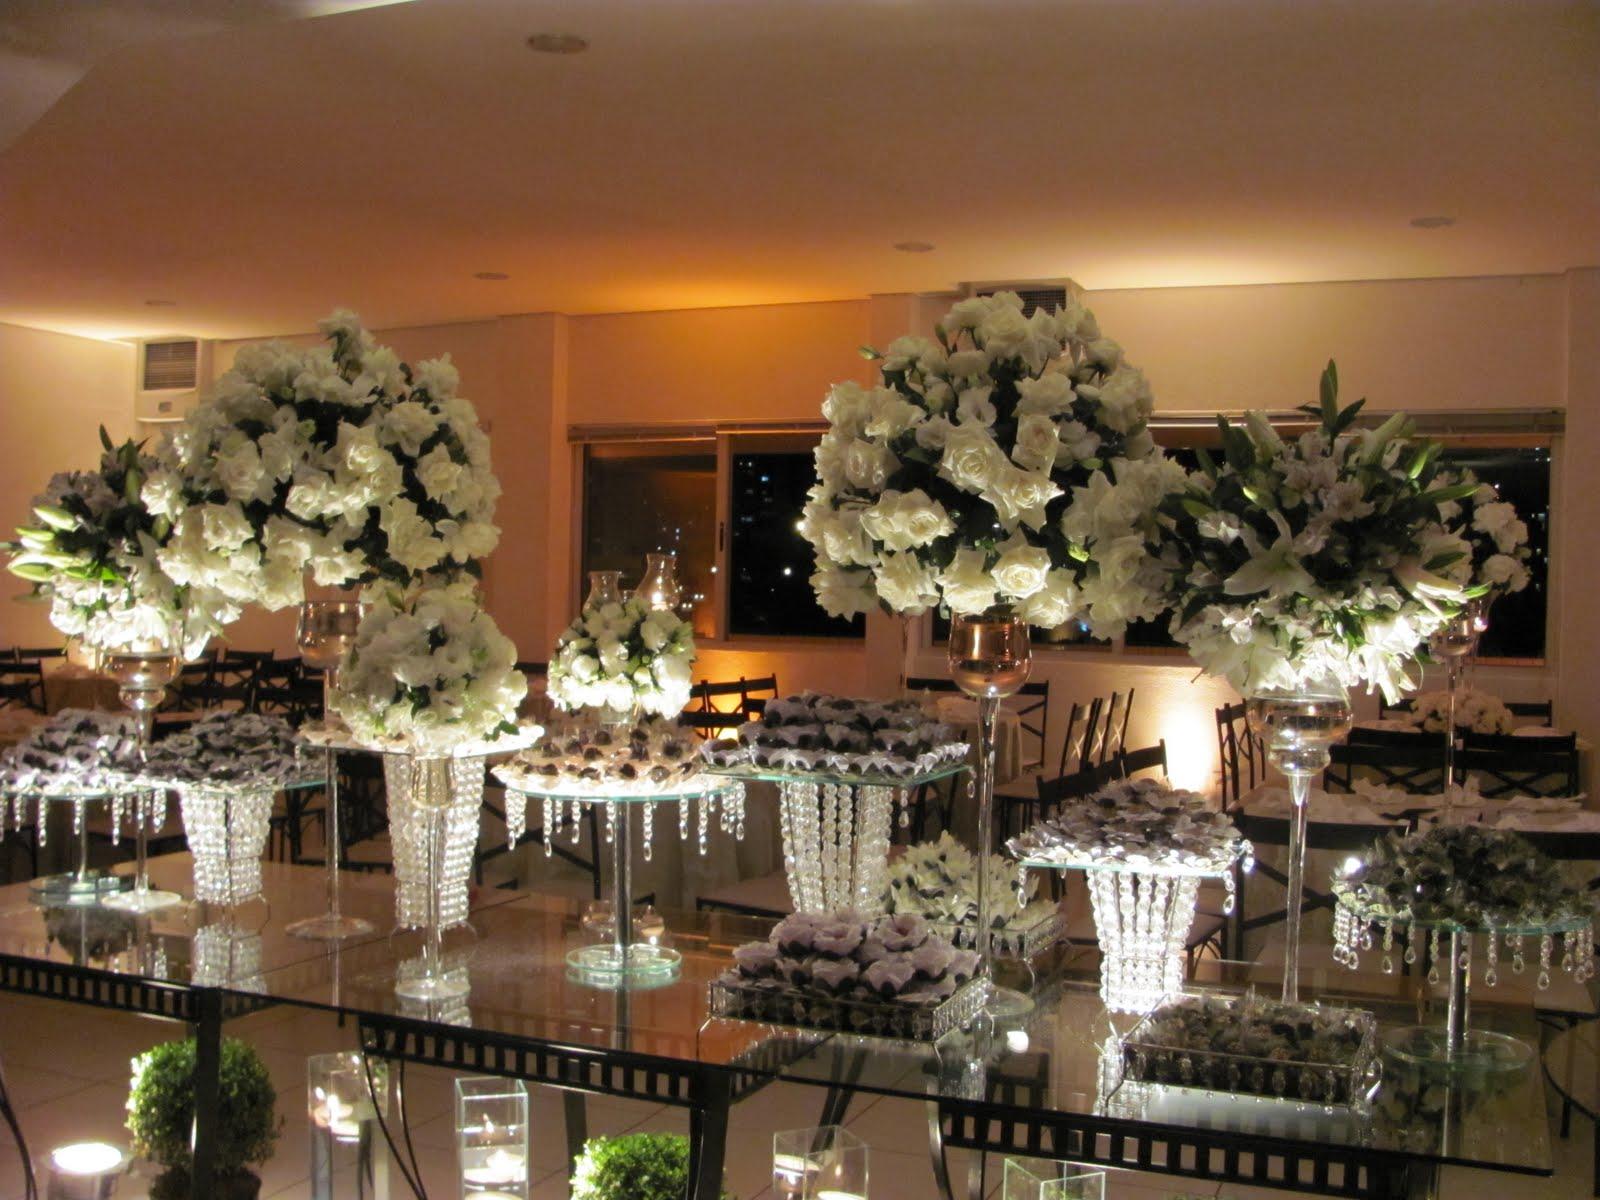 decoracao branca e verde para casamento : decoracao branca e verde para casamento:decoração branca e verde vidros e velas